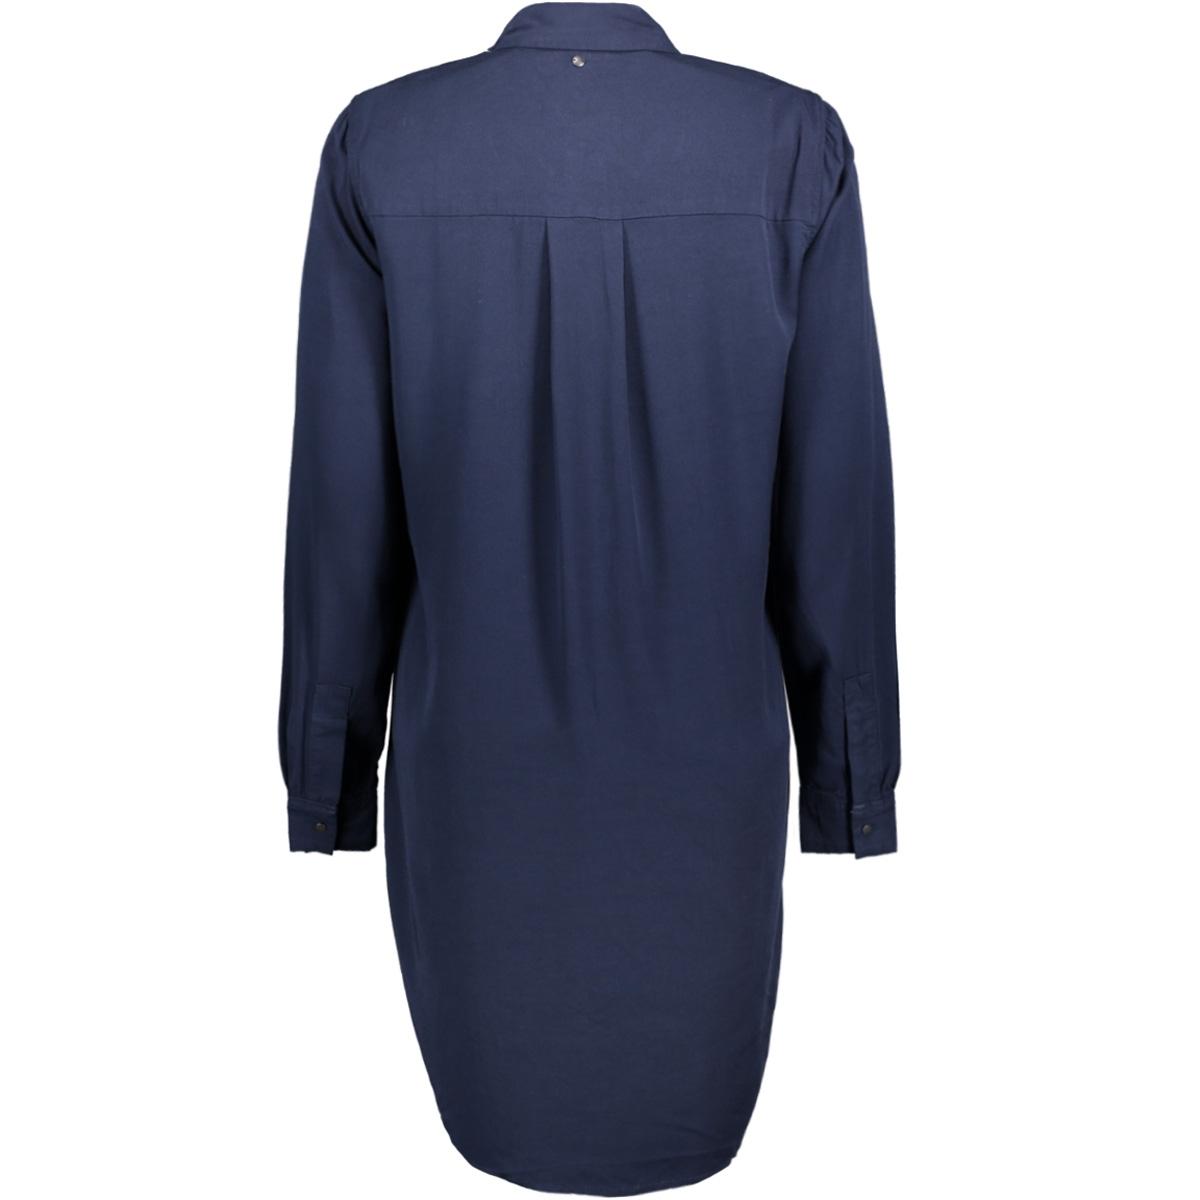 22001234 sandwich blouse 40138